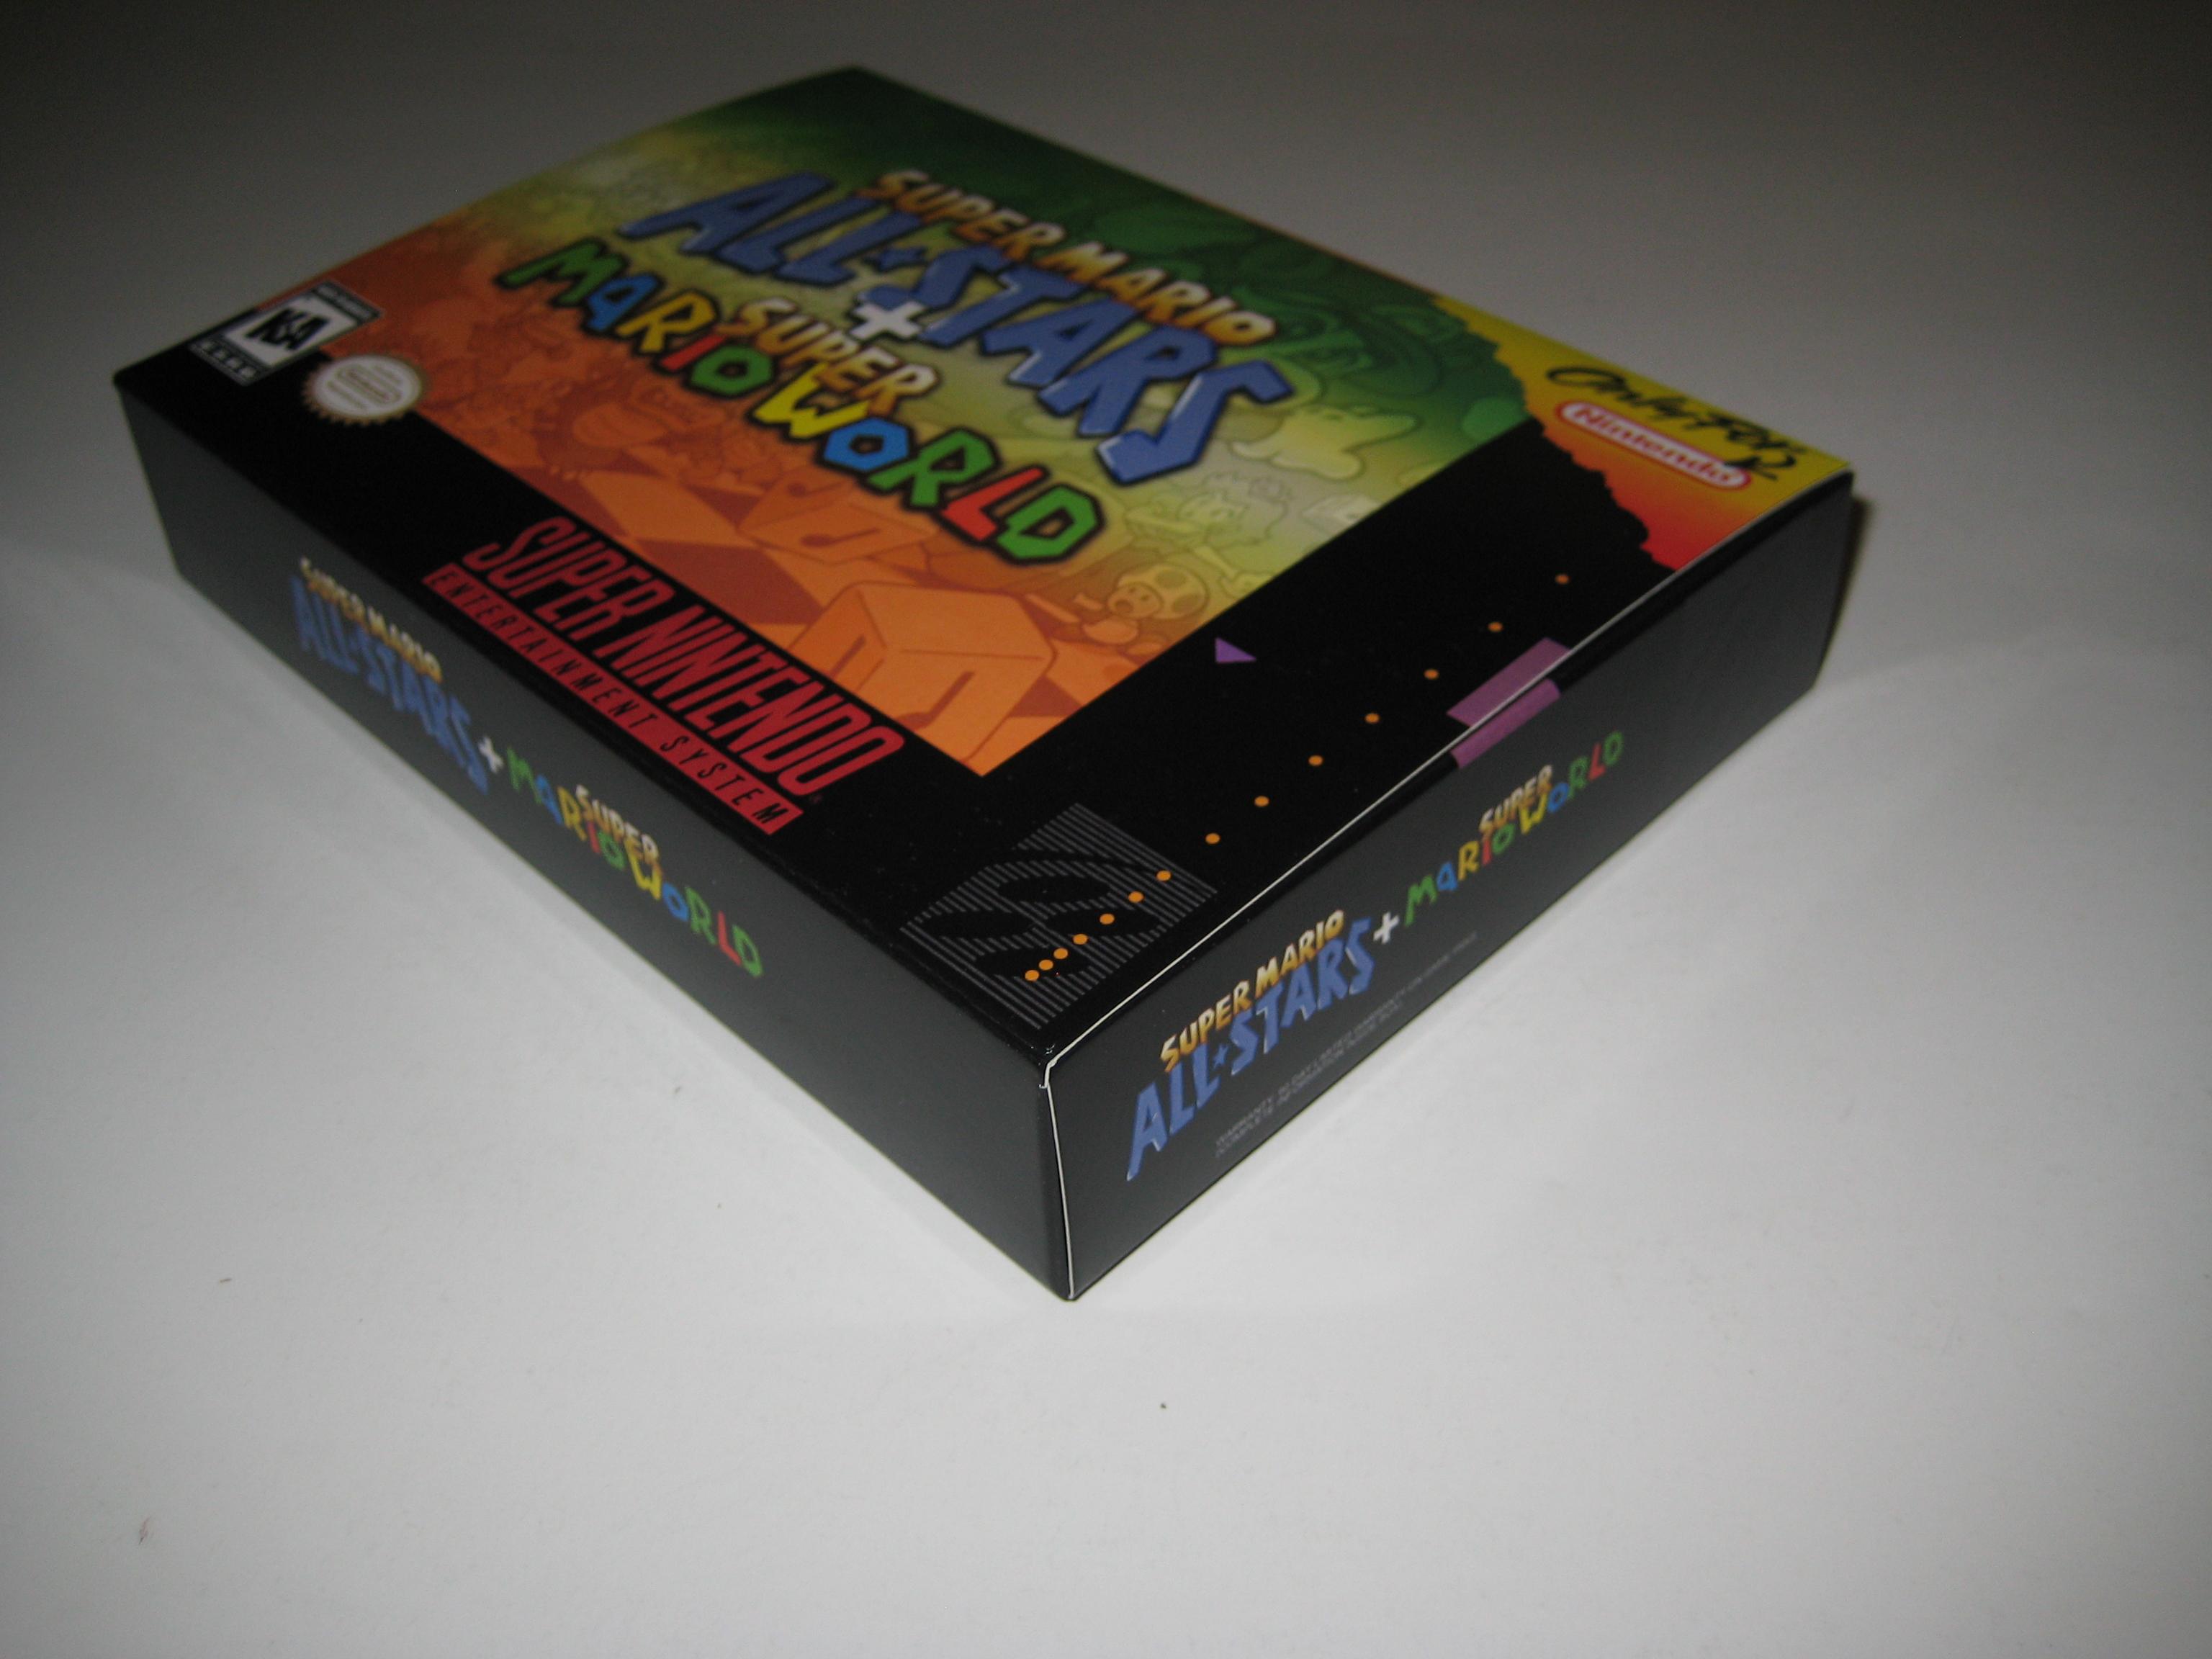 Retro Games Collecting 101 | Retro Bunny